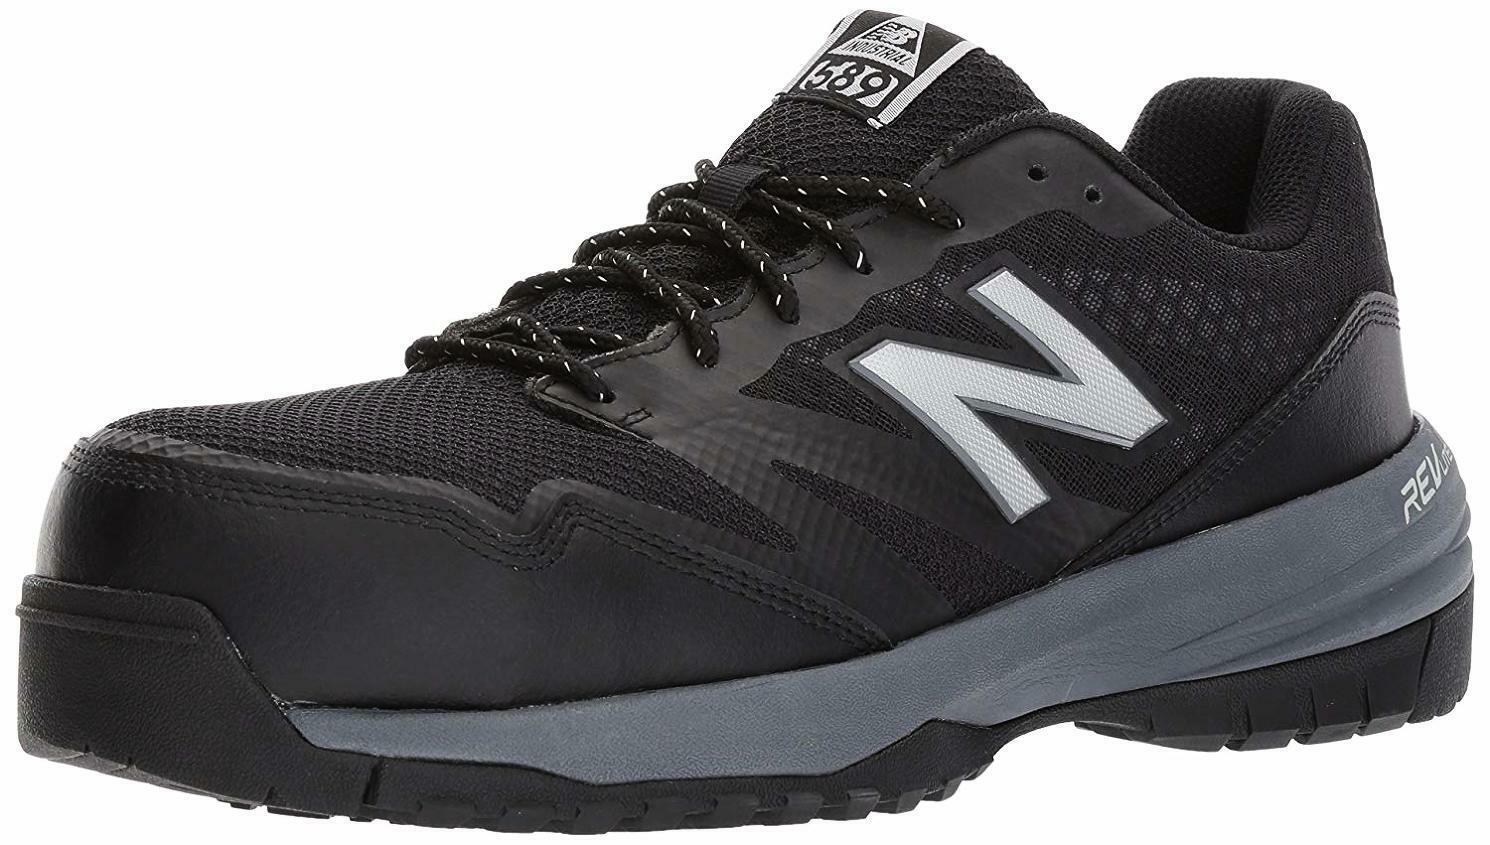 New Balance Men's 589V1 Work Training shoes